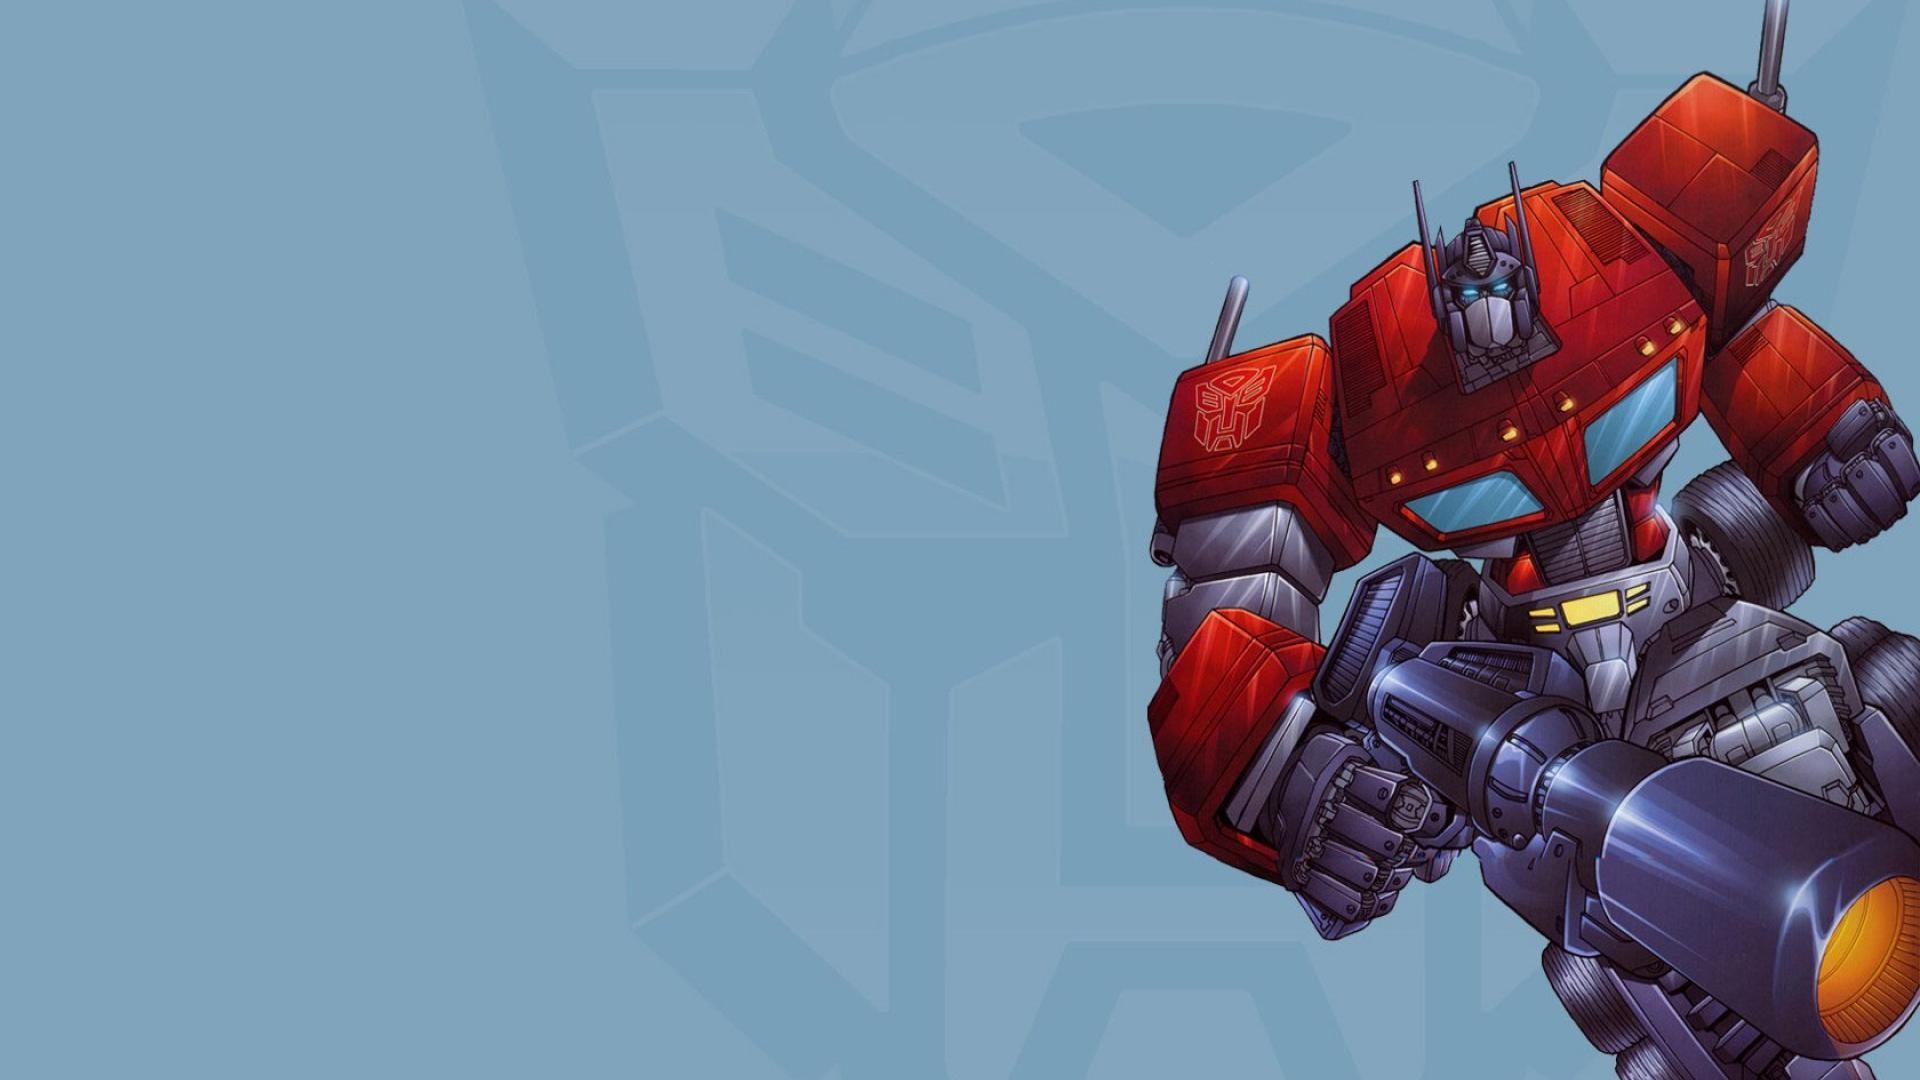 Transformers prime wallpaper hd 73 images - Transformers prime wallpaper ...